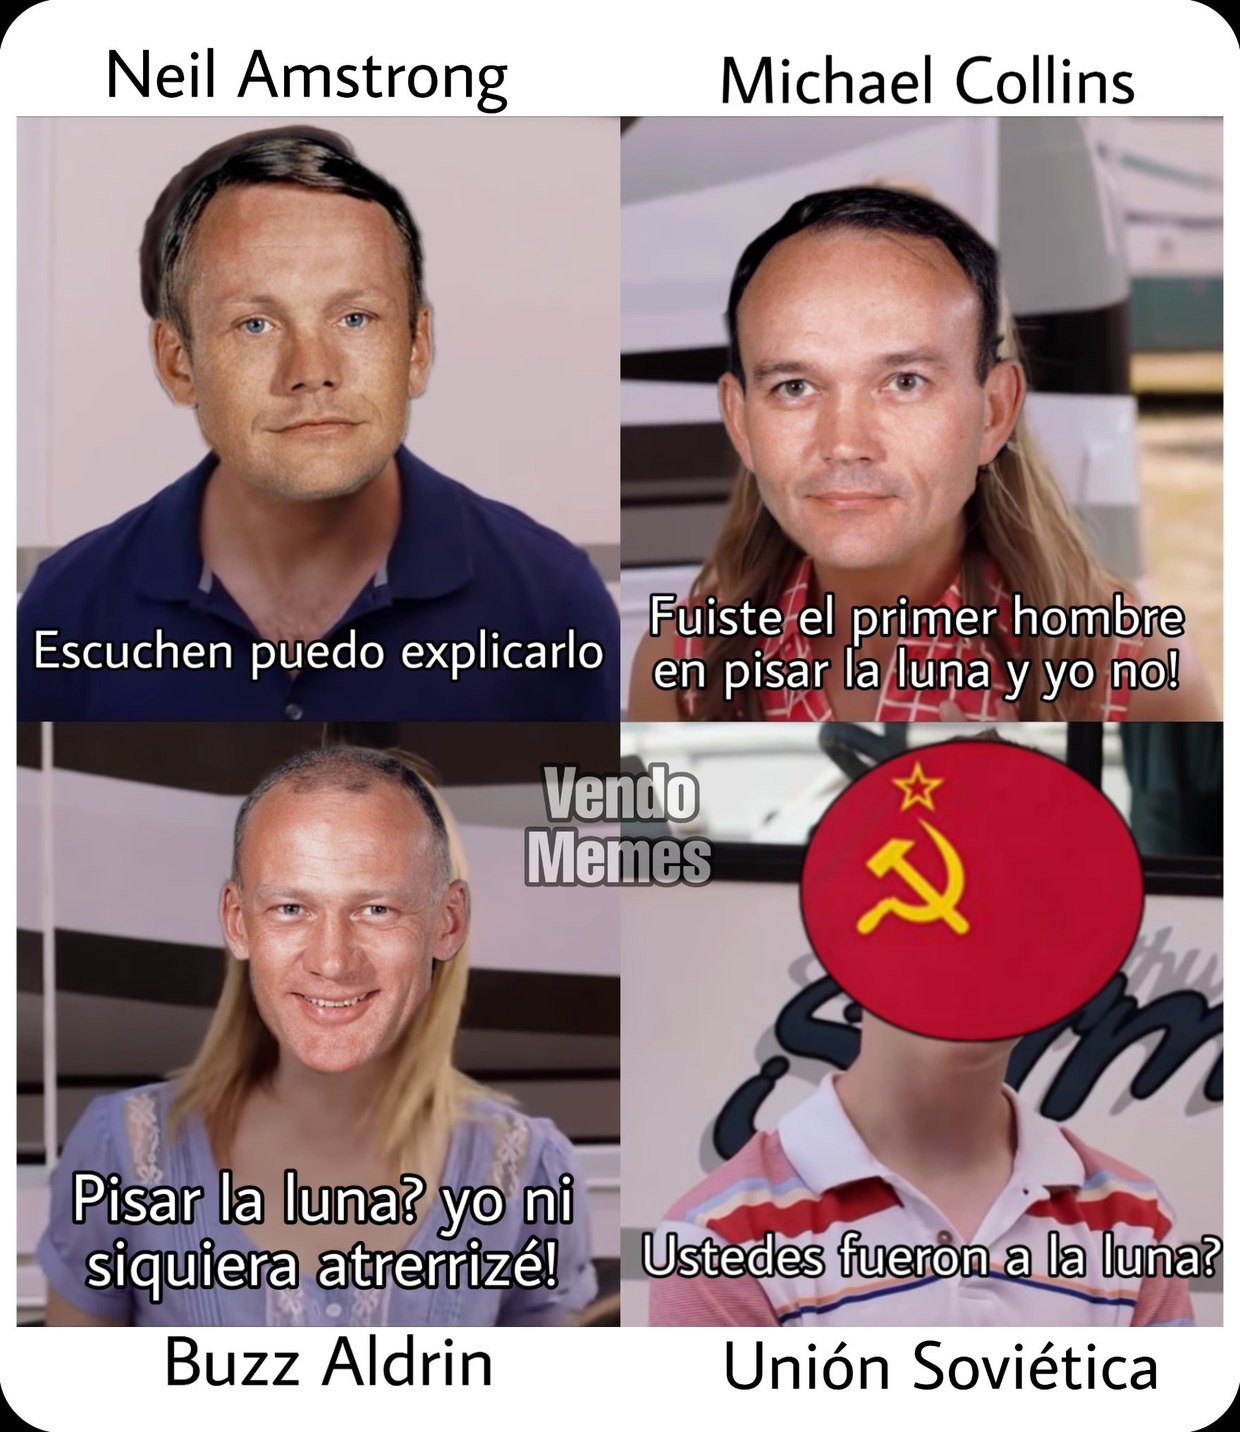 Apolo 11 - meme